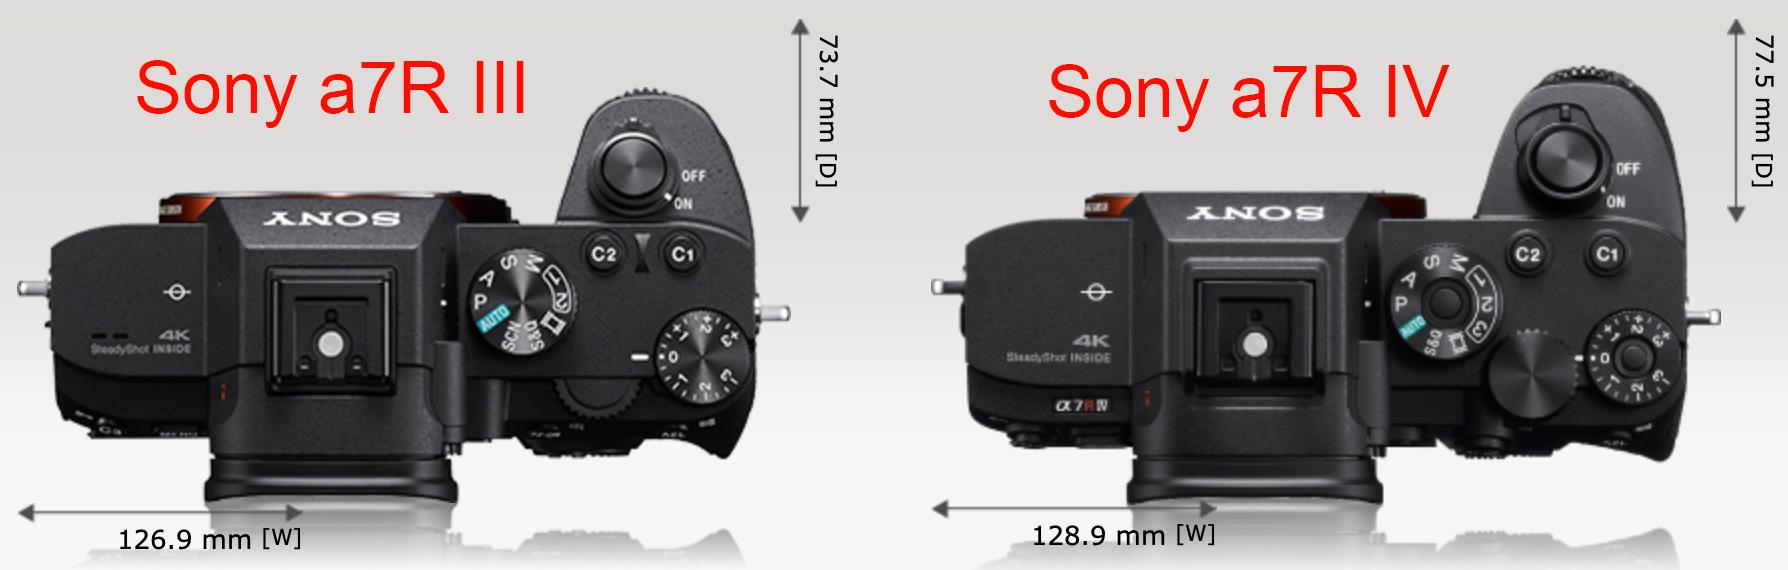 Фотоаппарат Sony a7R III или a7R IV - в чем разница